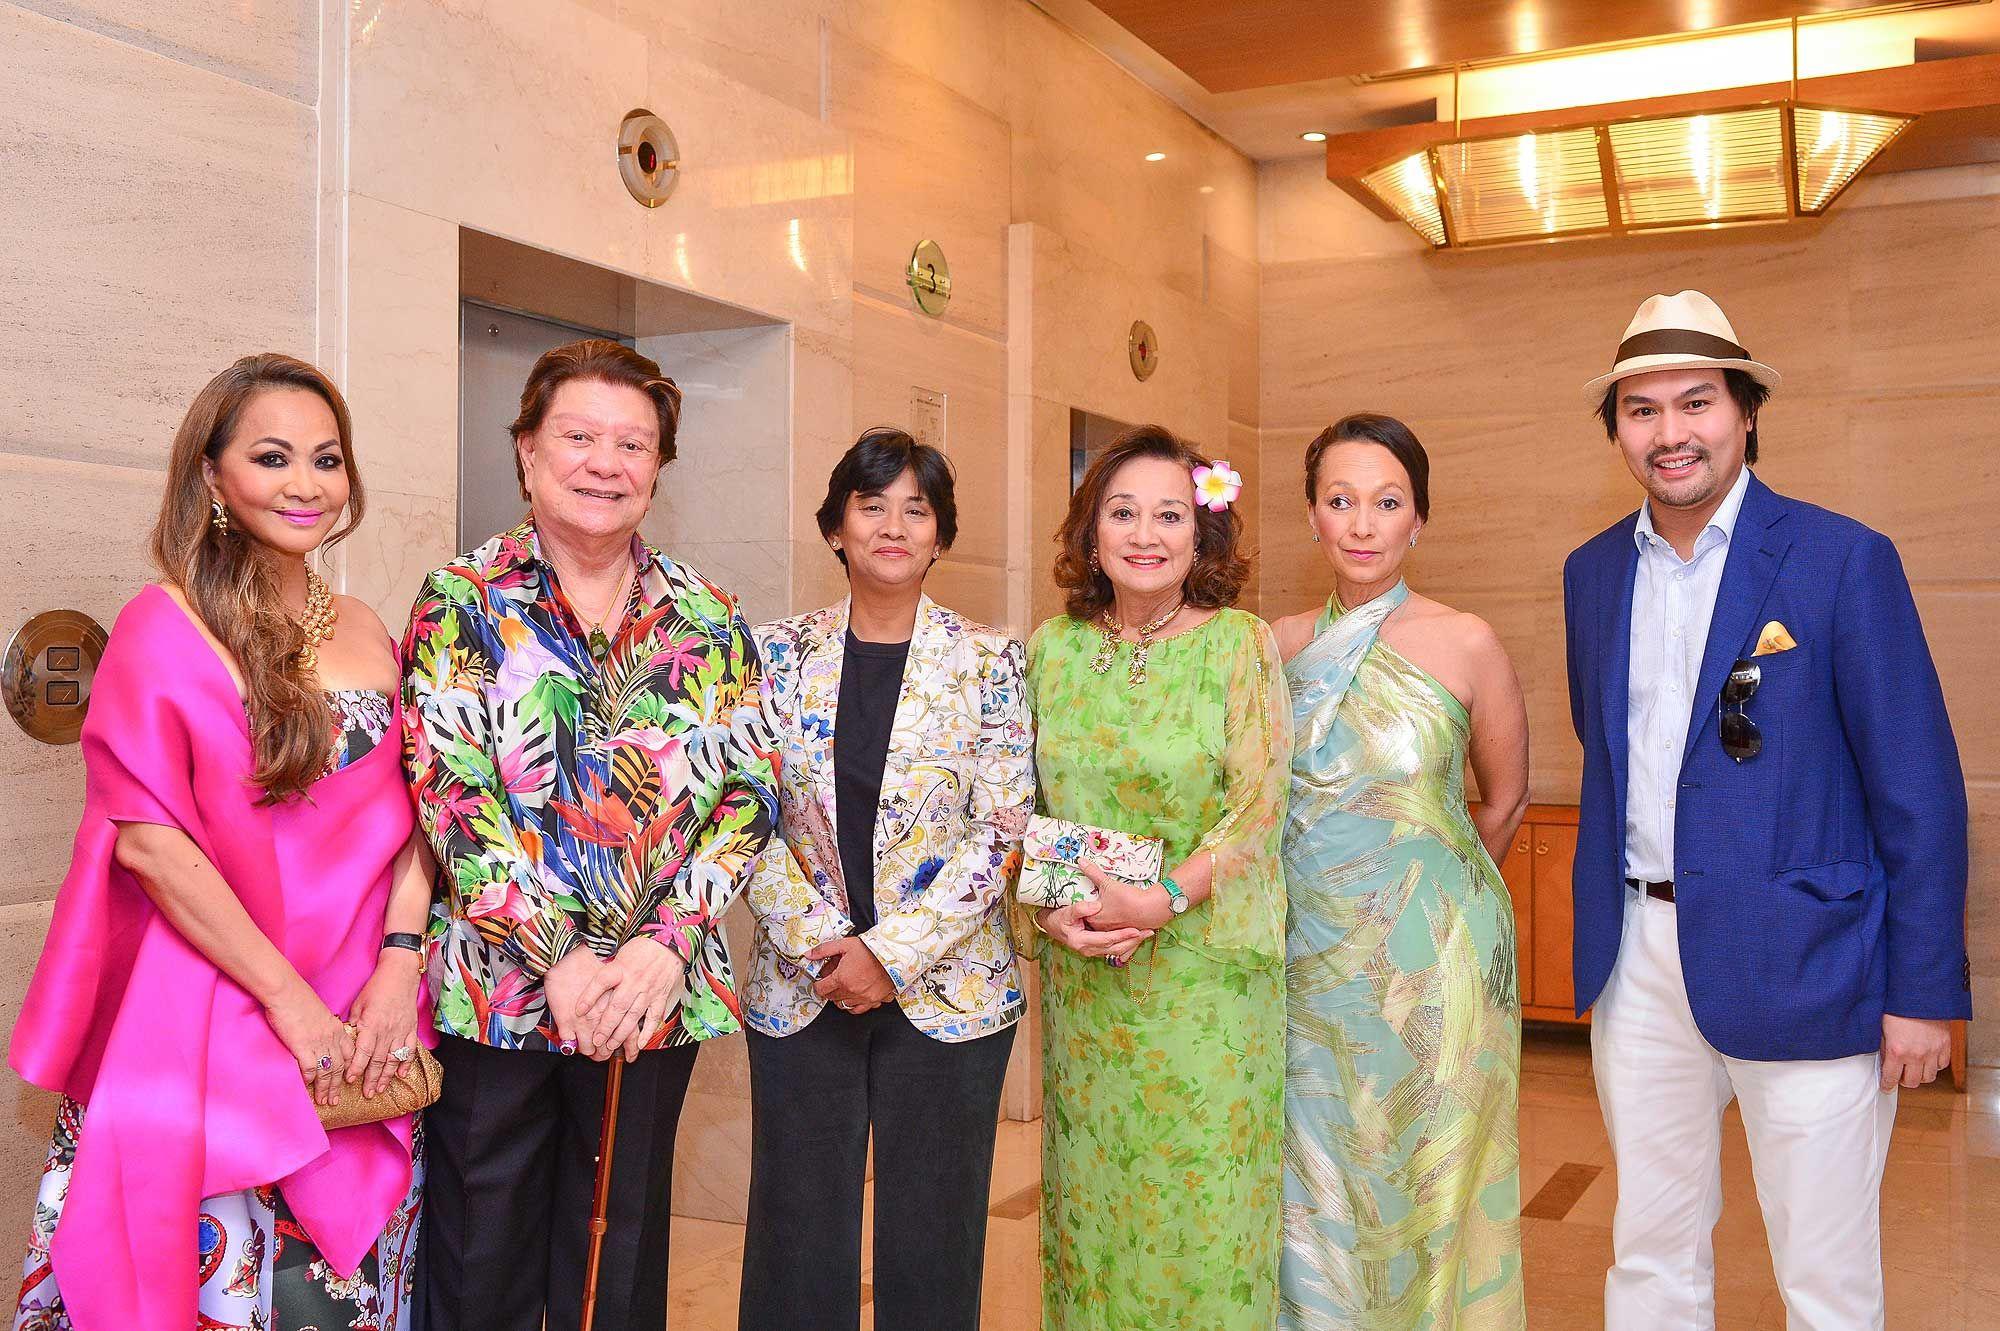 Che Engku Puan Sri Rozeeta, Tunku Mizan, Puteri Intan Shafinaz, Tunku Dara Naquiah, Tunku Soraya Dakhlah and Tunku Ali Redhauddin